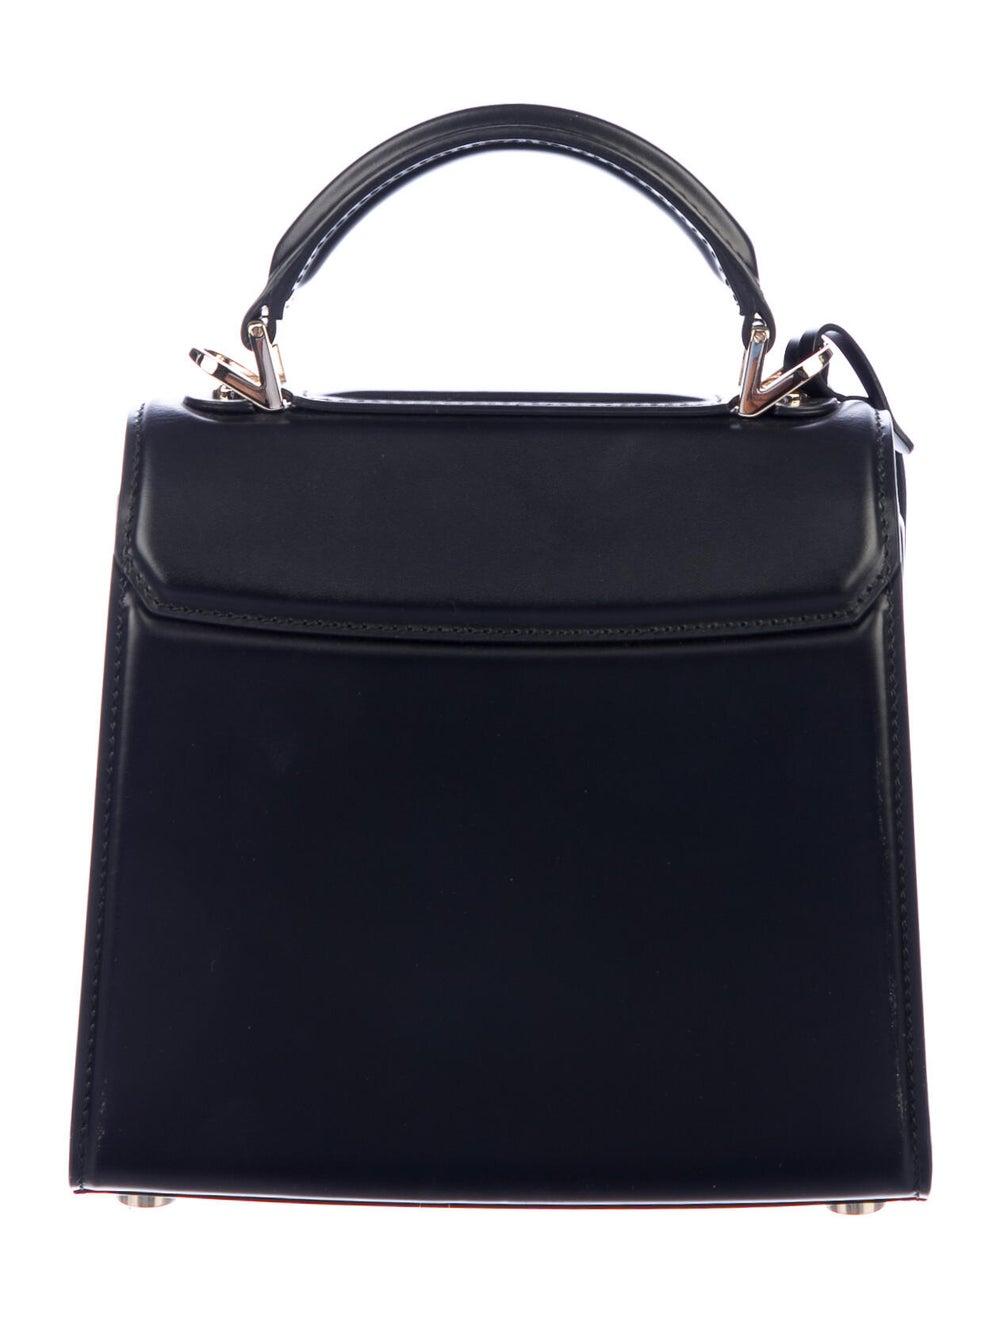 Salvatore Ferragamo Leather Boxyz Bag Black - image 4